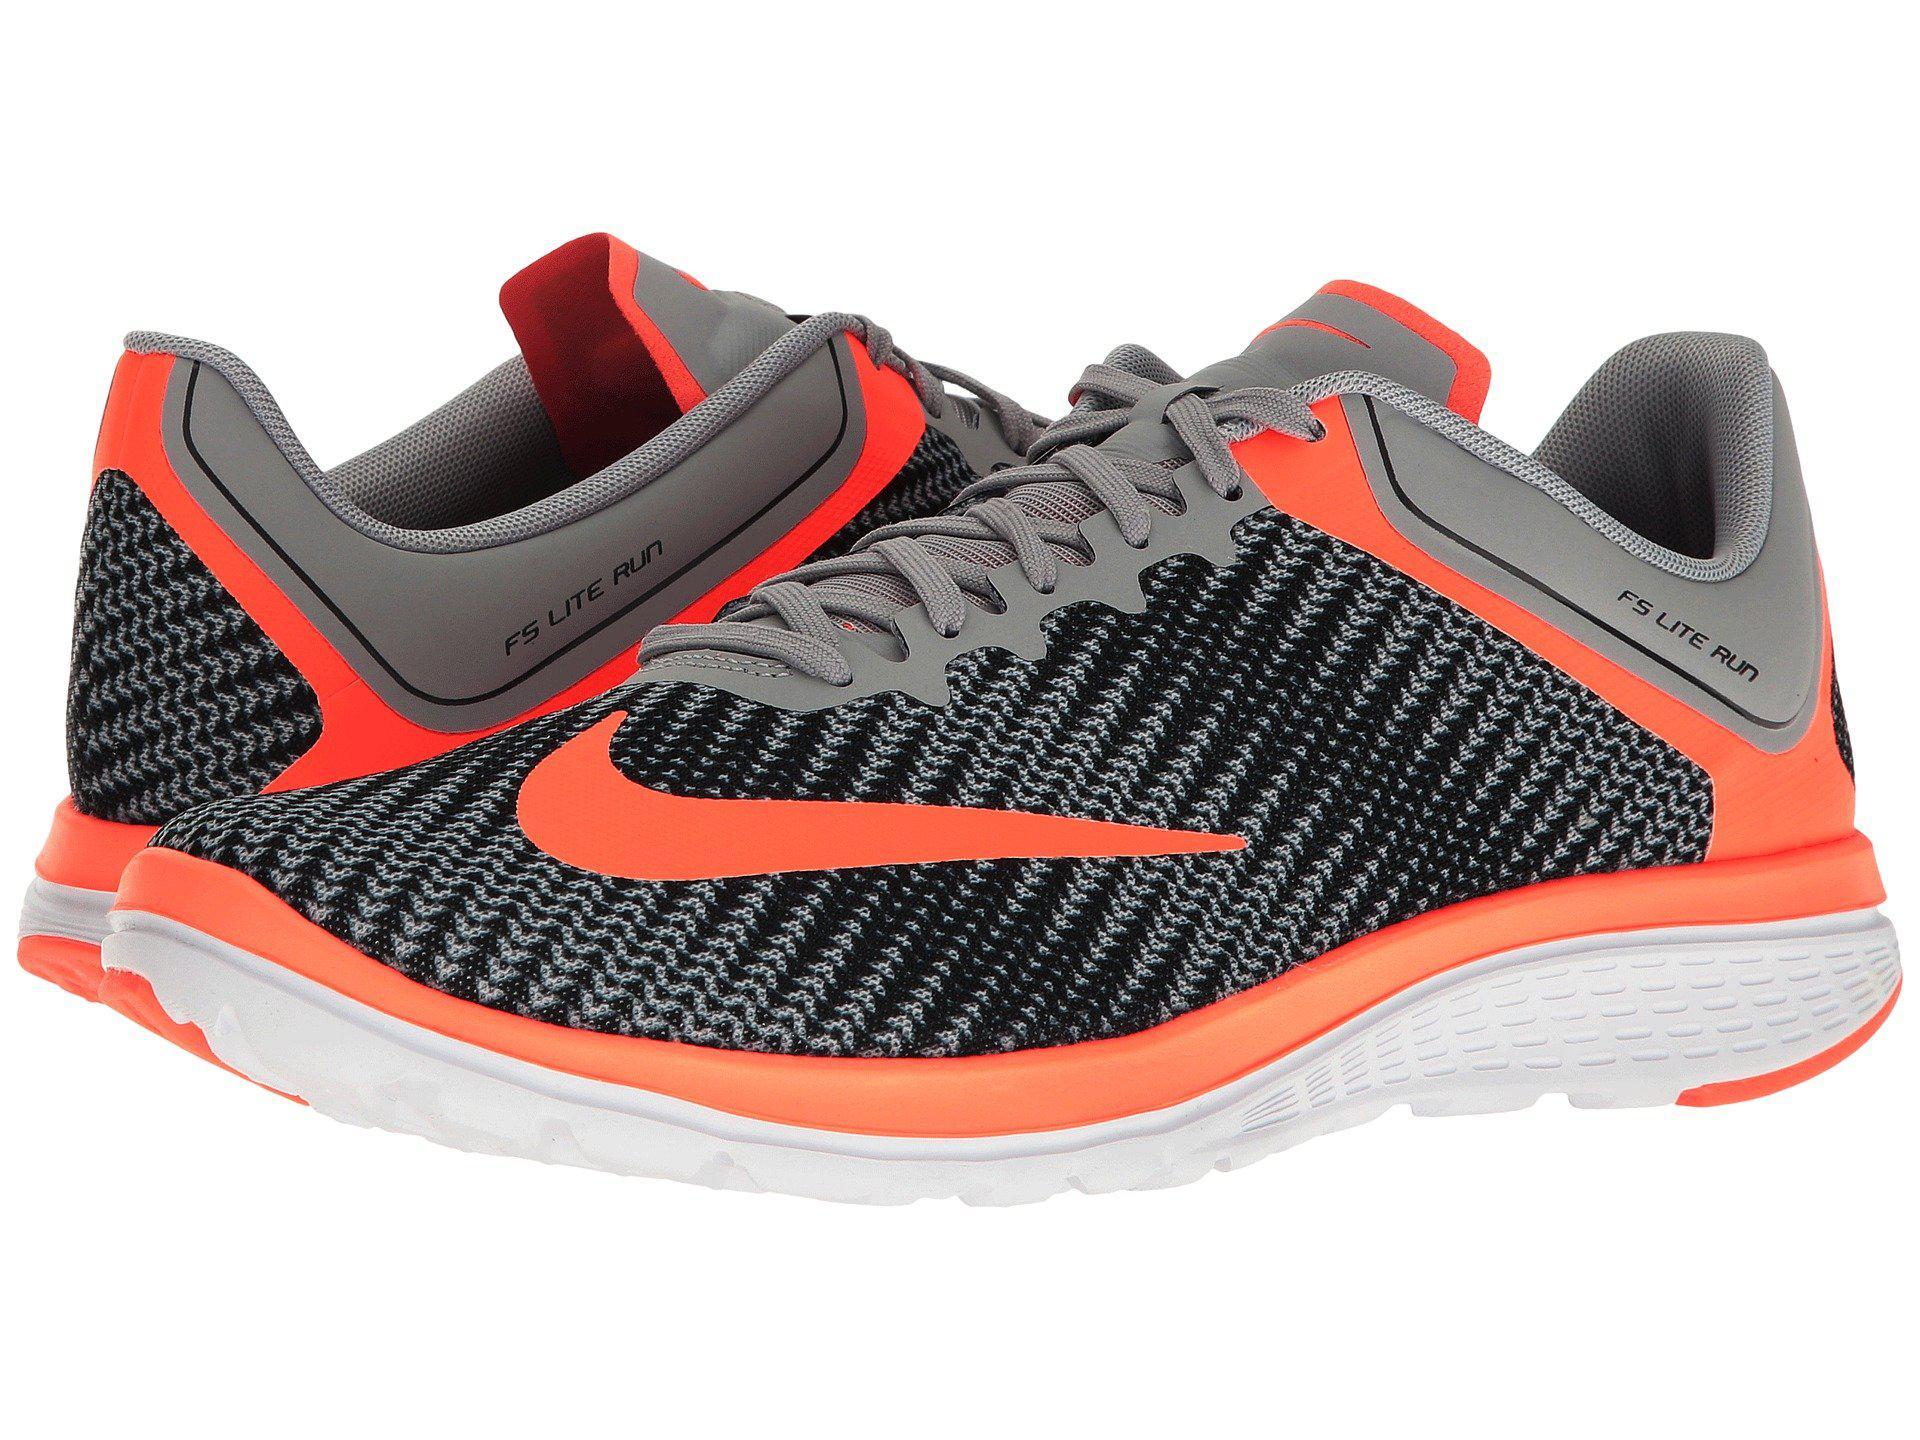 a2effc7843ad Lyst - Nike Fs Lite Run 4 Premium for Men